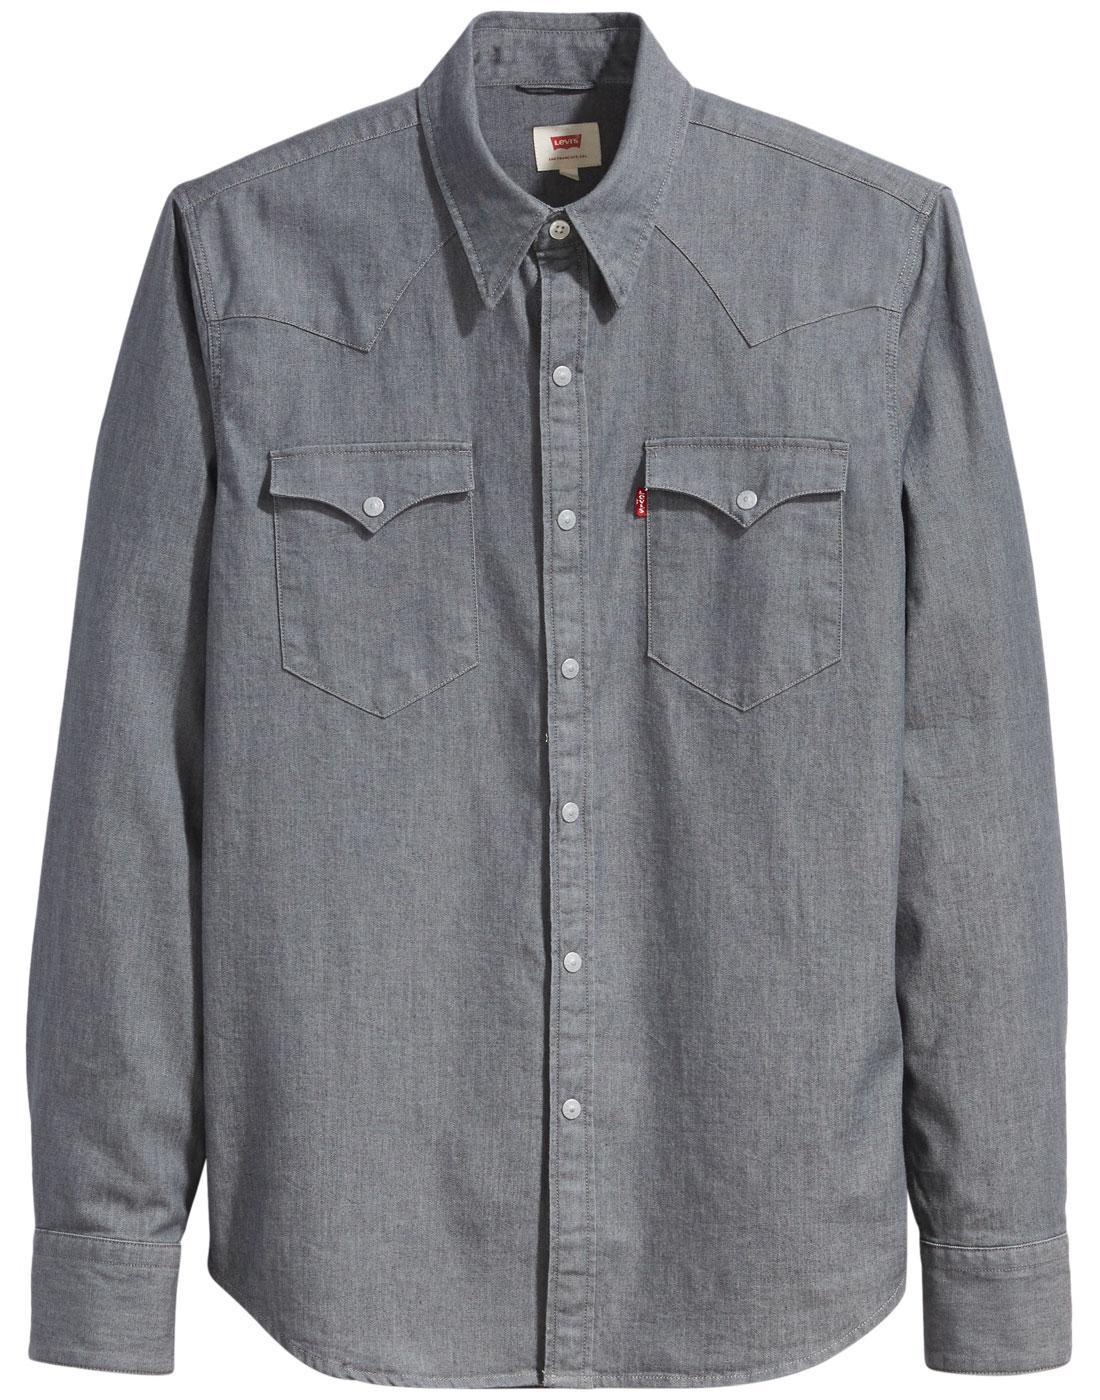 LEVI'S Barstow Retro 70s Denim Western Shirt (GSR)